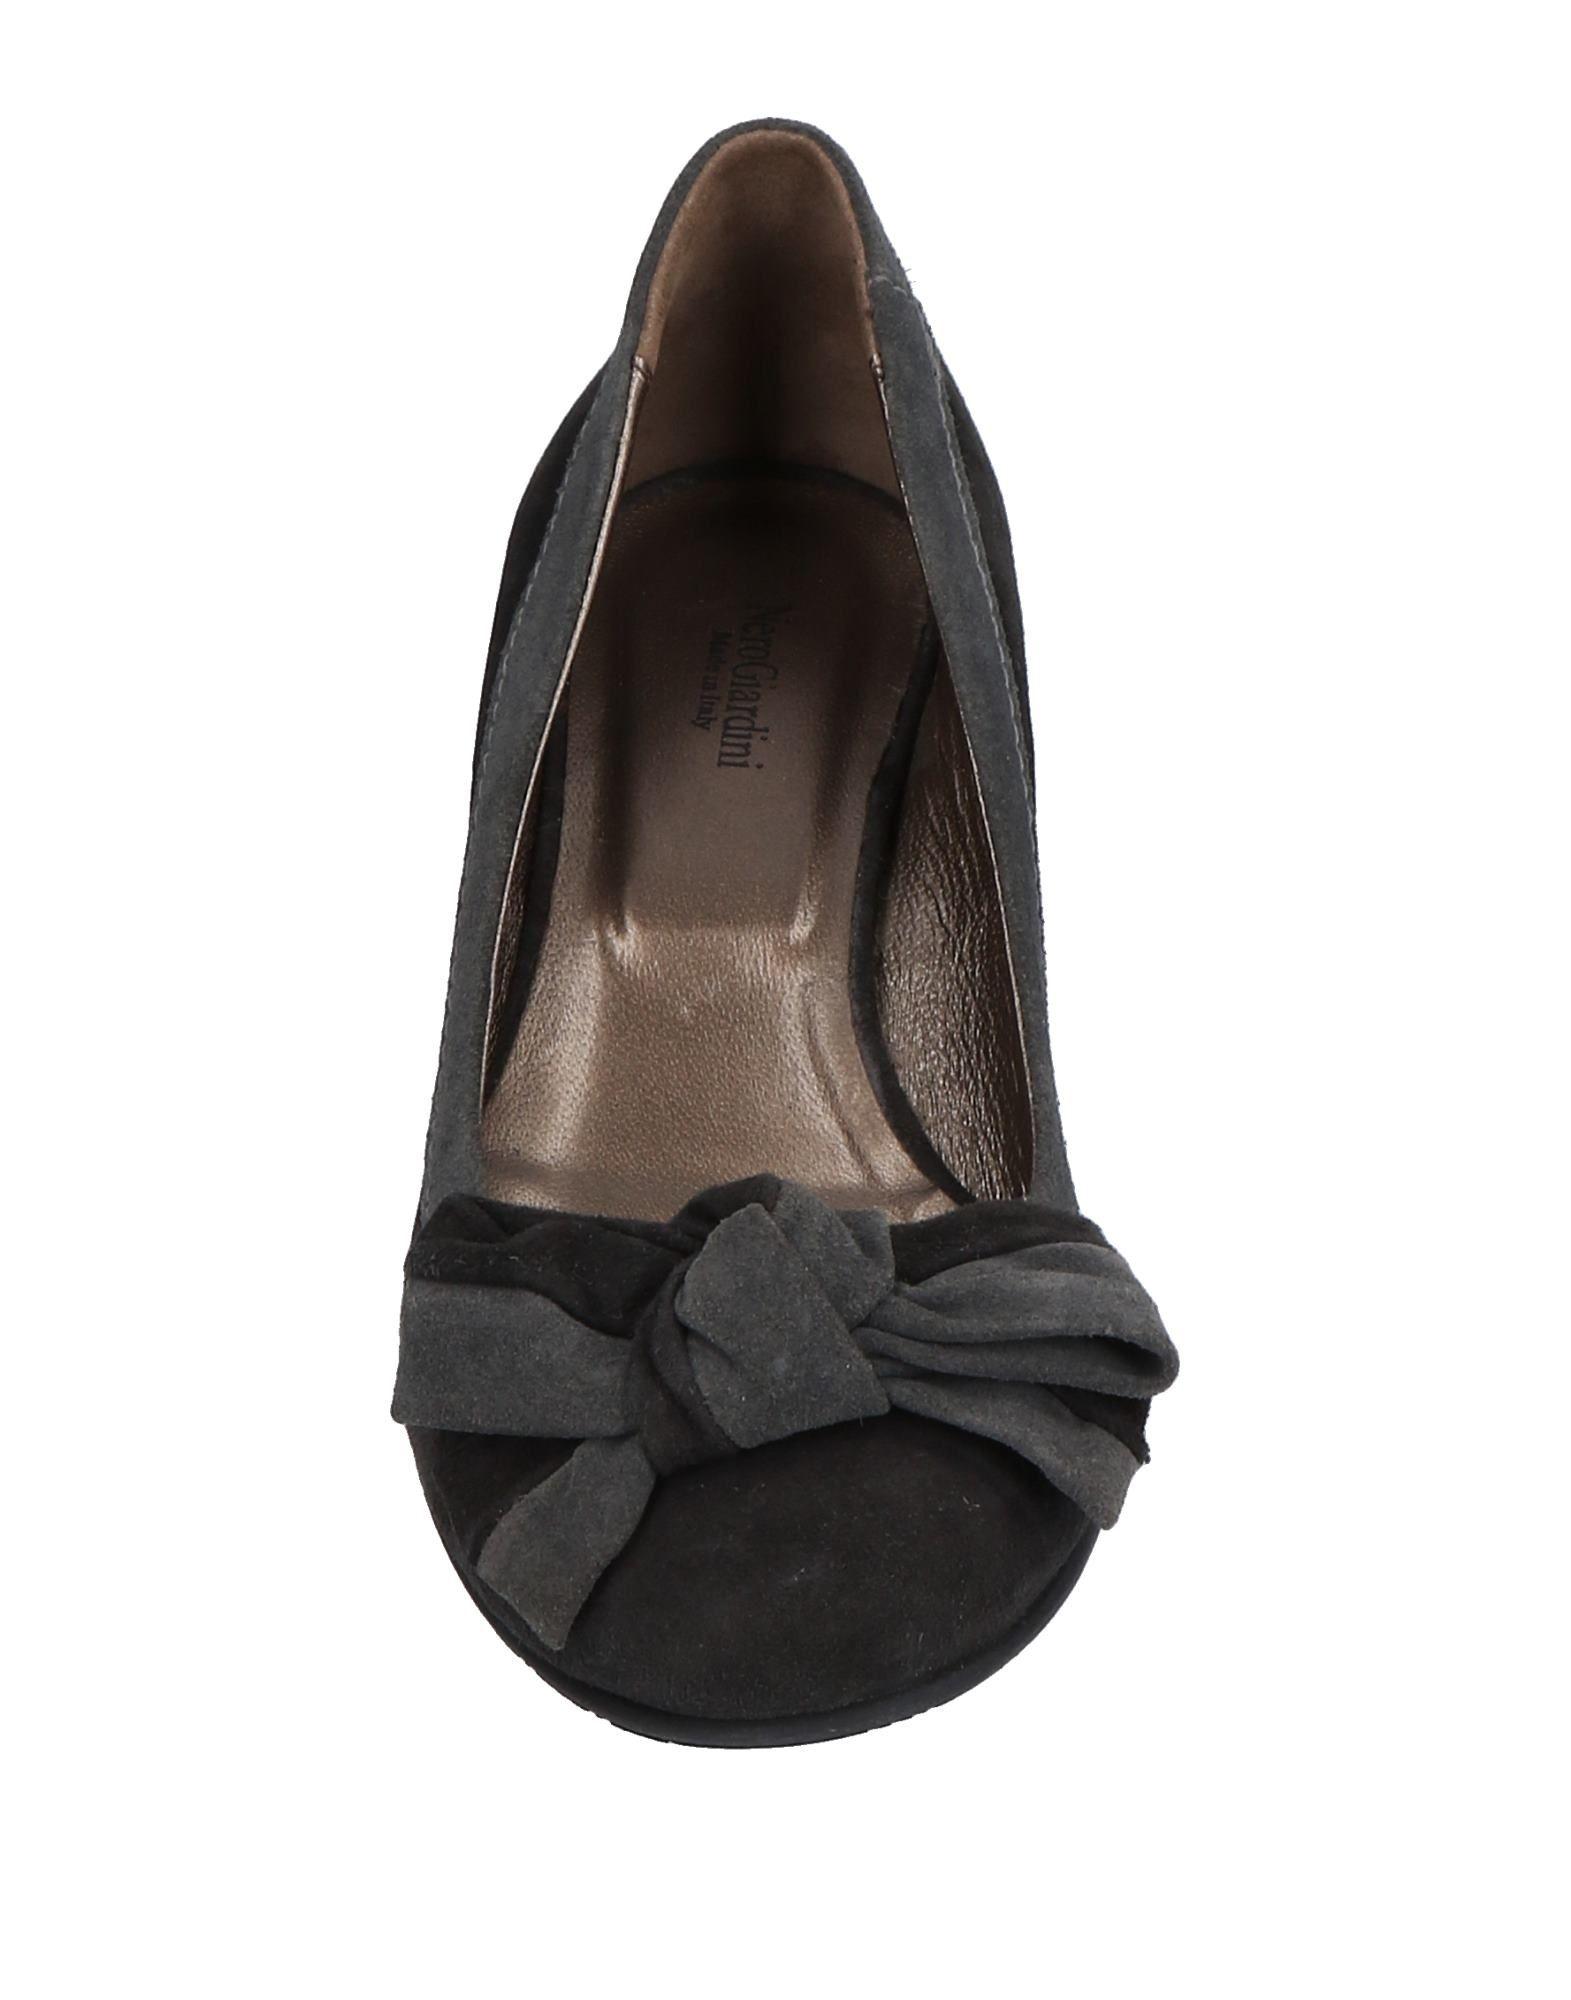 Nero Giardini Pumps Damen Damen Pumps  11522392JU Gute Qualität beliebte Schuhe 1d1ed8